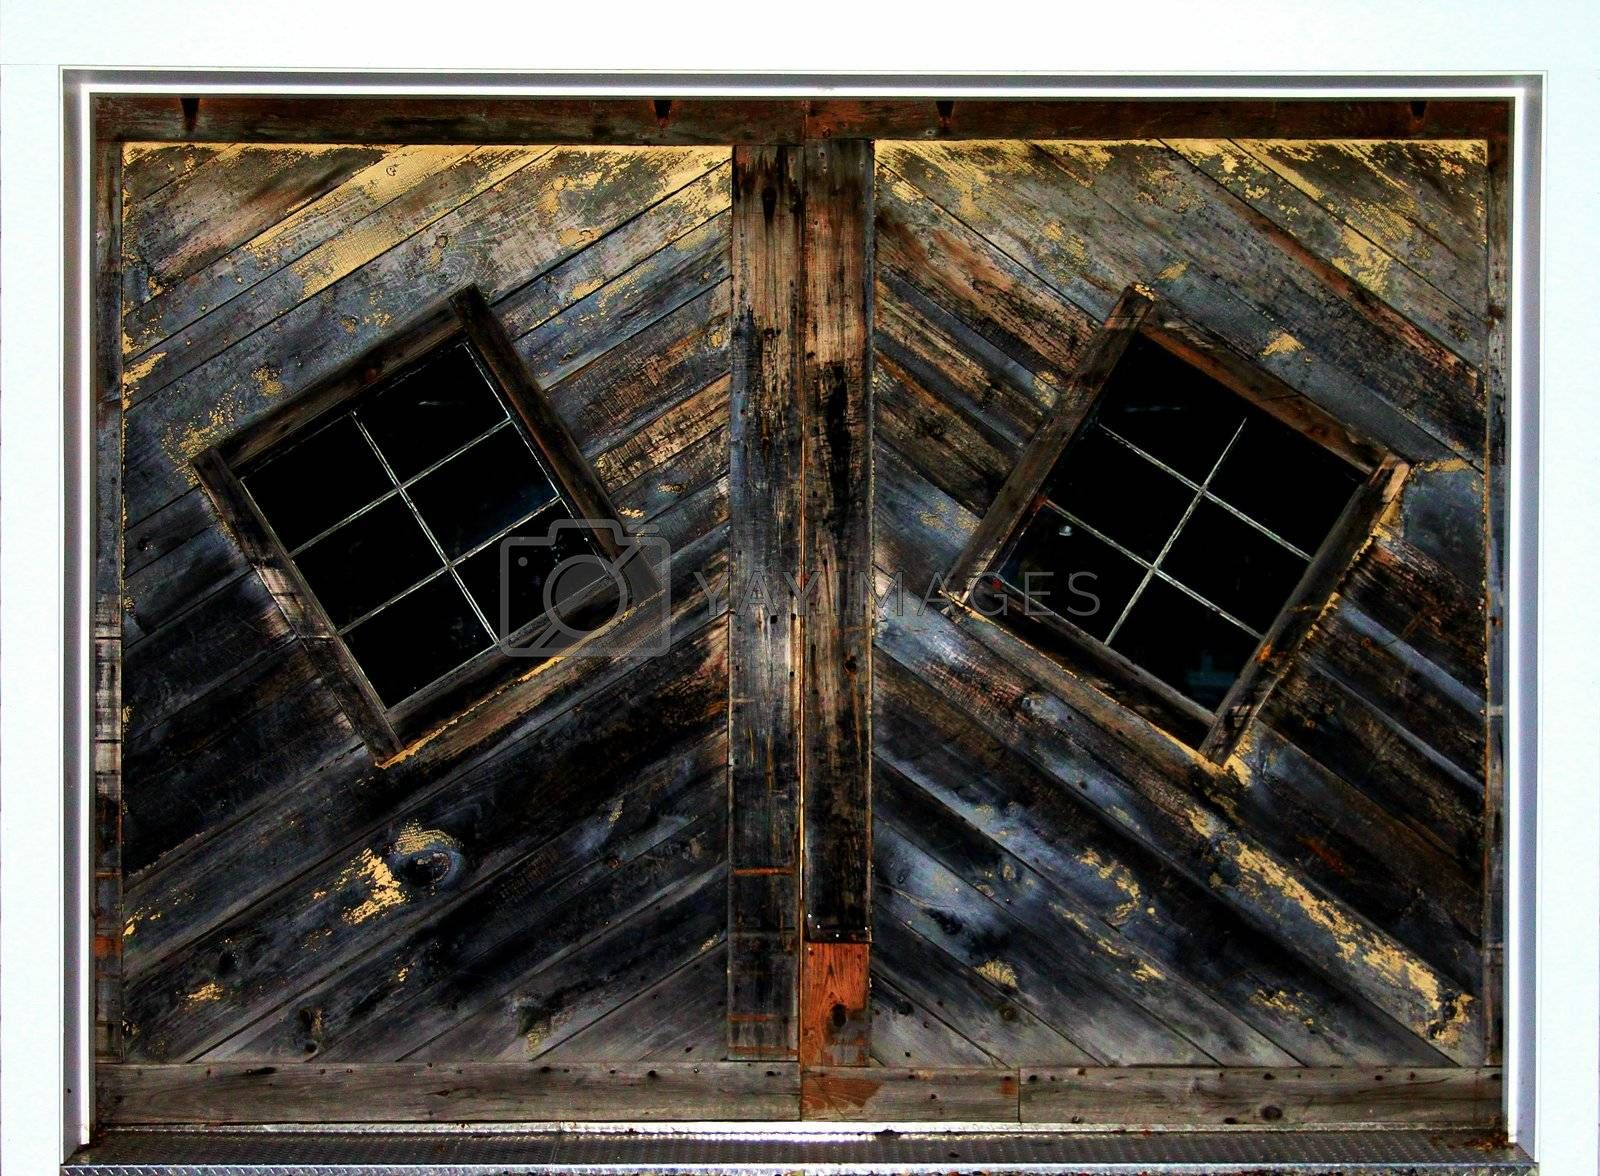 Old rustic barn door with odd windows